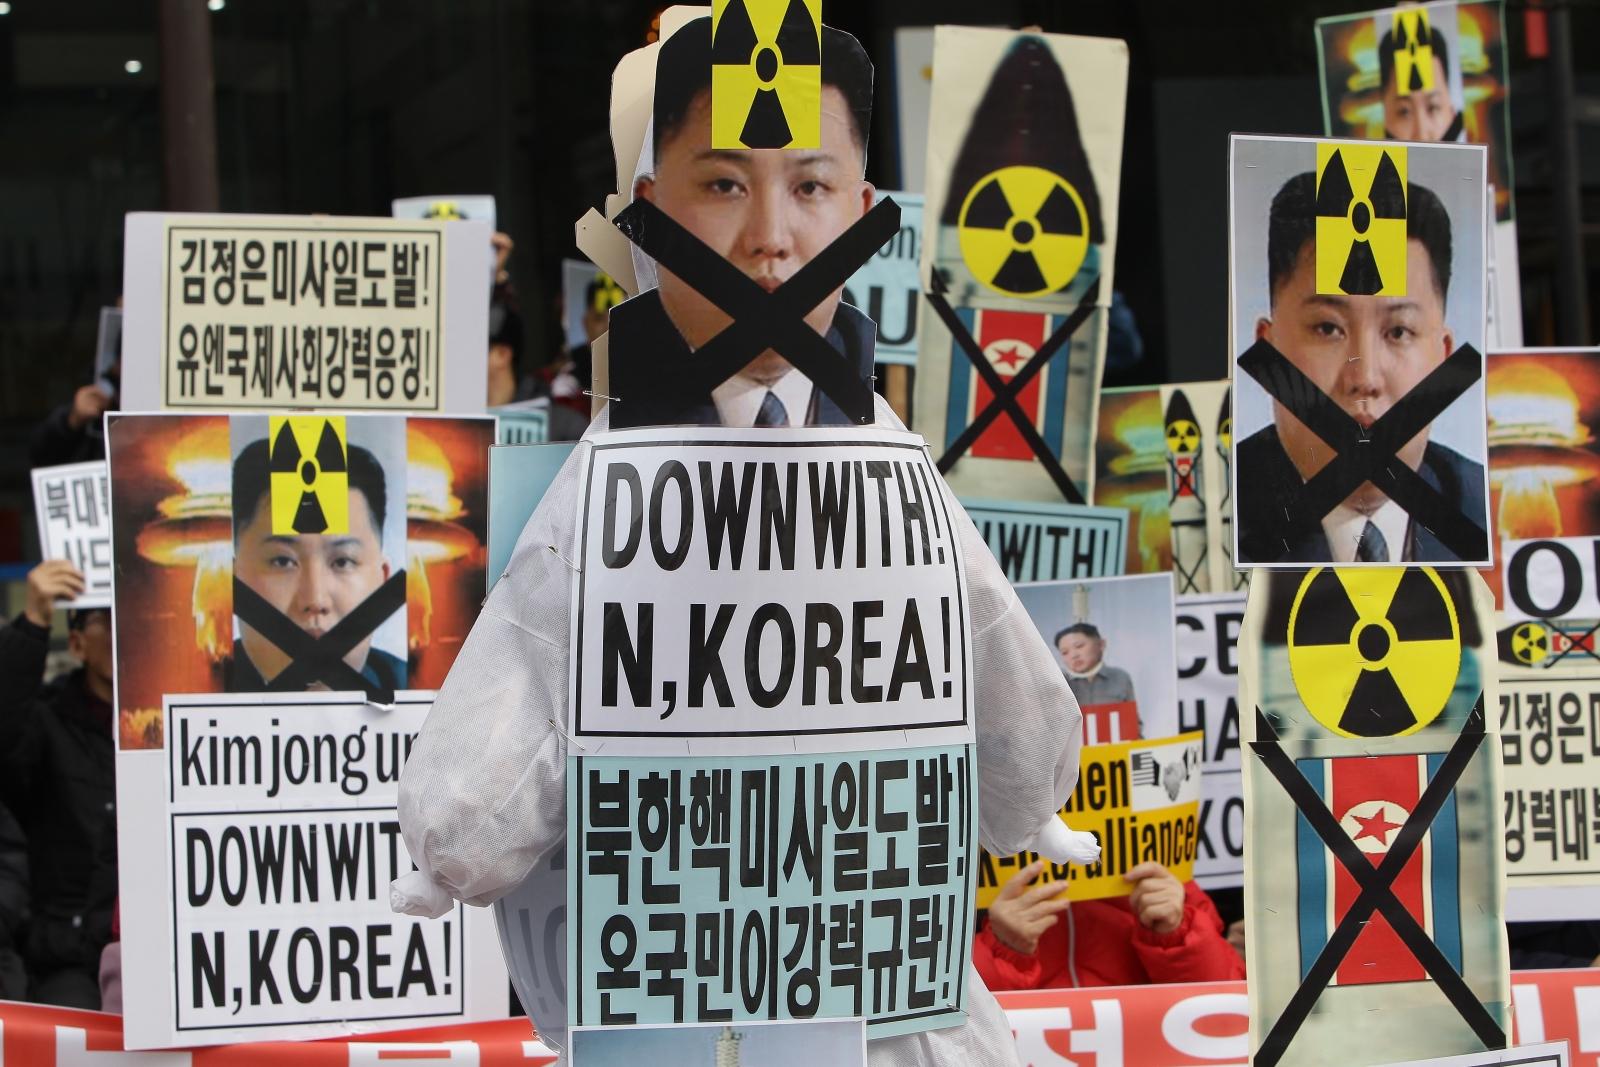 South Korea protest against North Korea